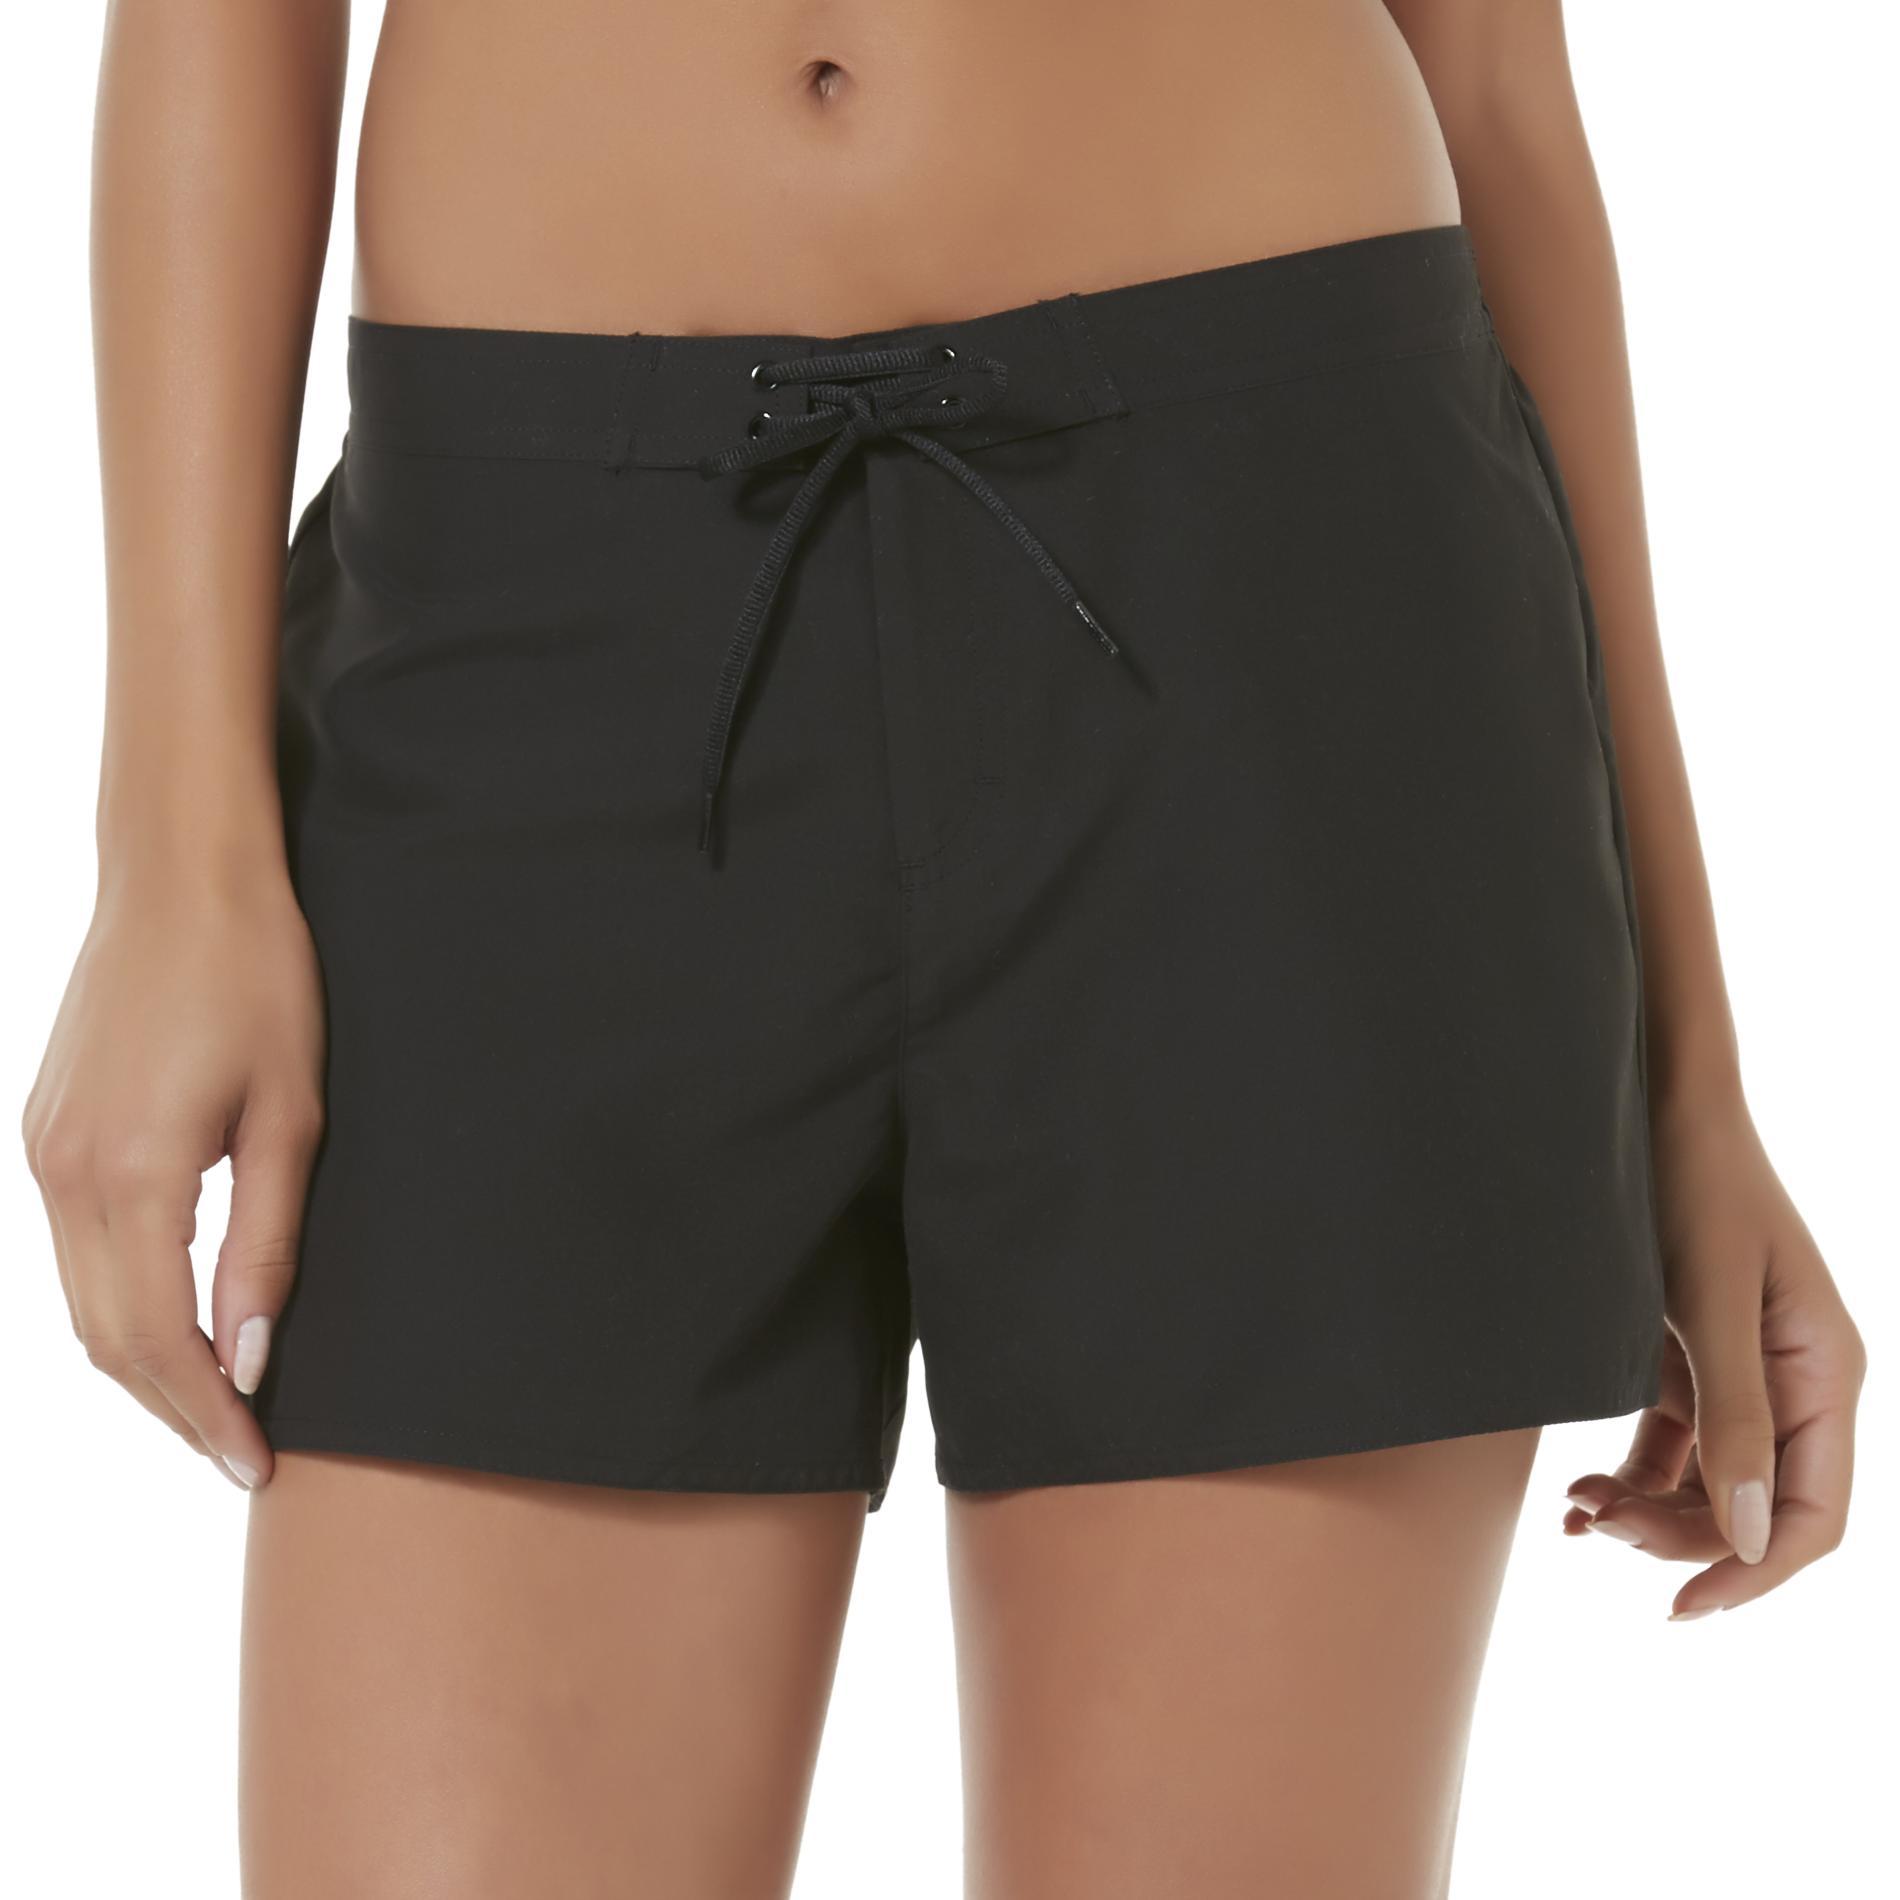 womens swim shorts tropical escape womenu0027s woven swim shorts - clothing - womenu0027s clothing -  womenu0027s swimwear AYBUTYJ